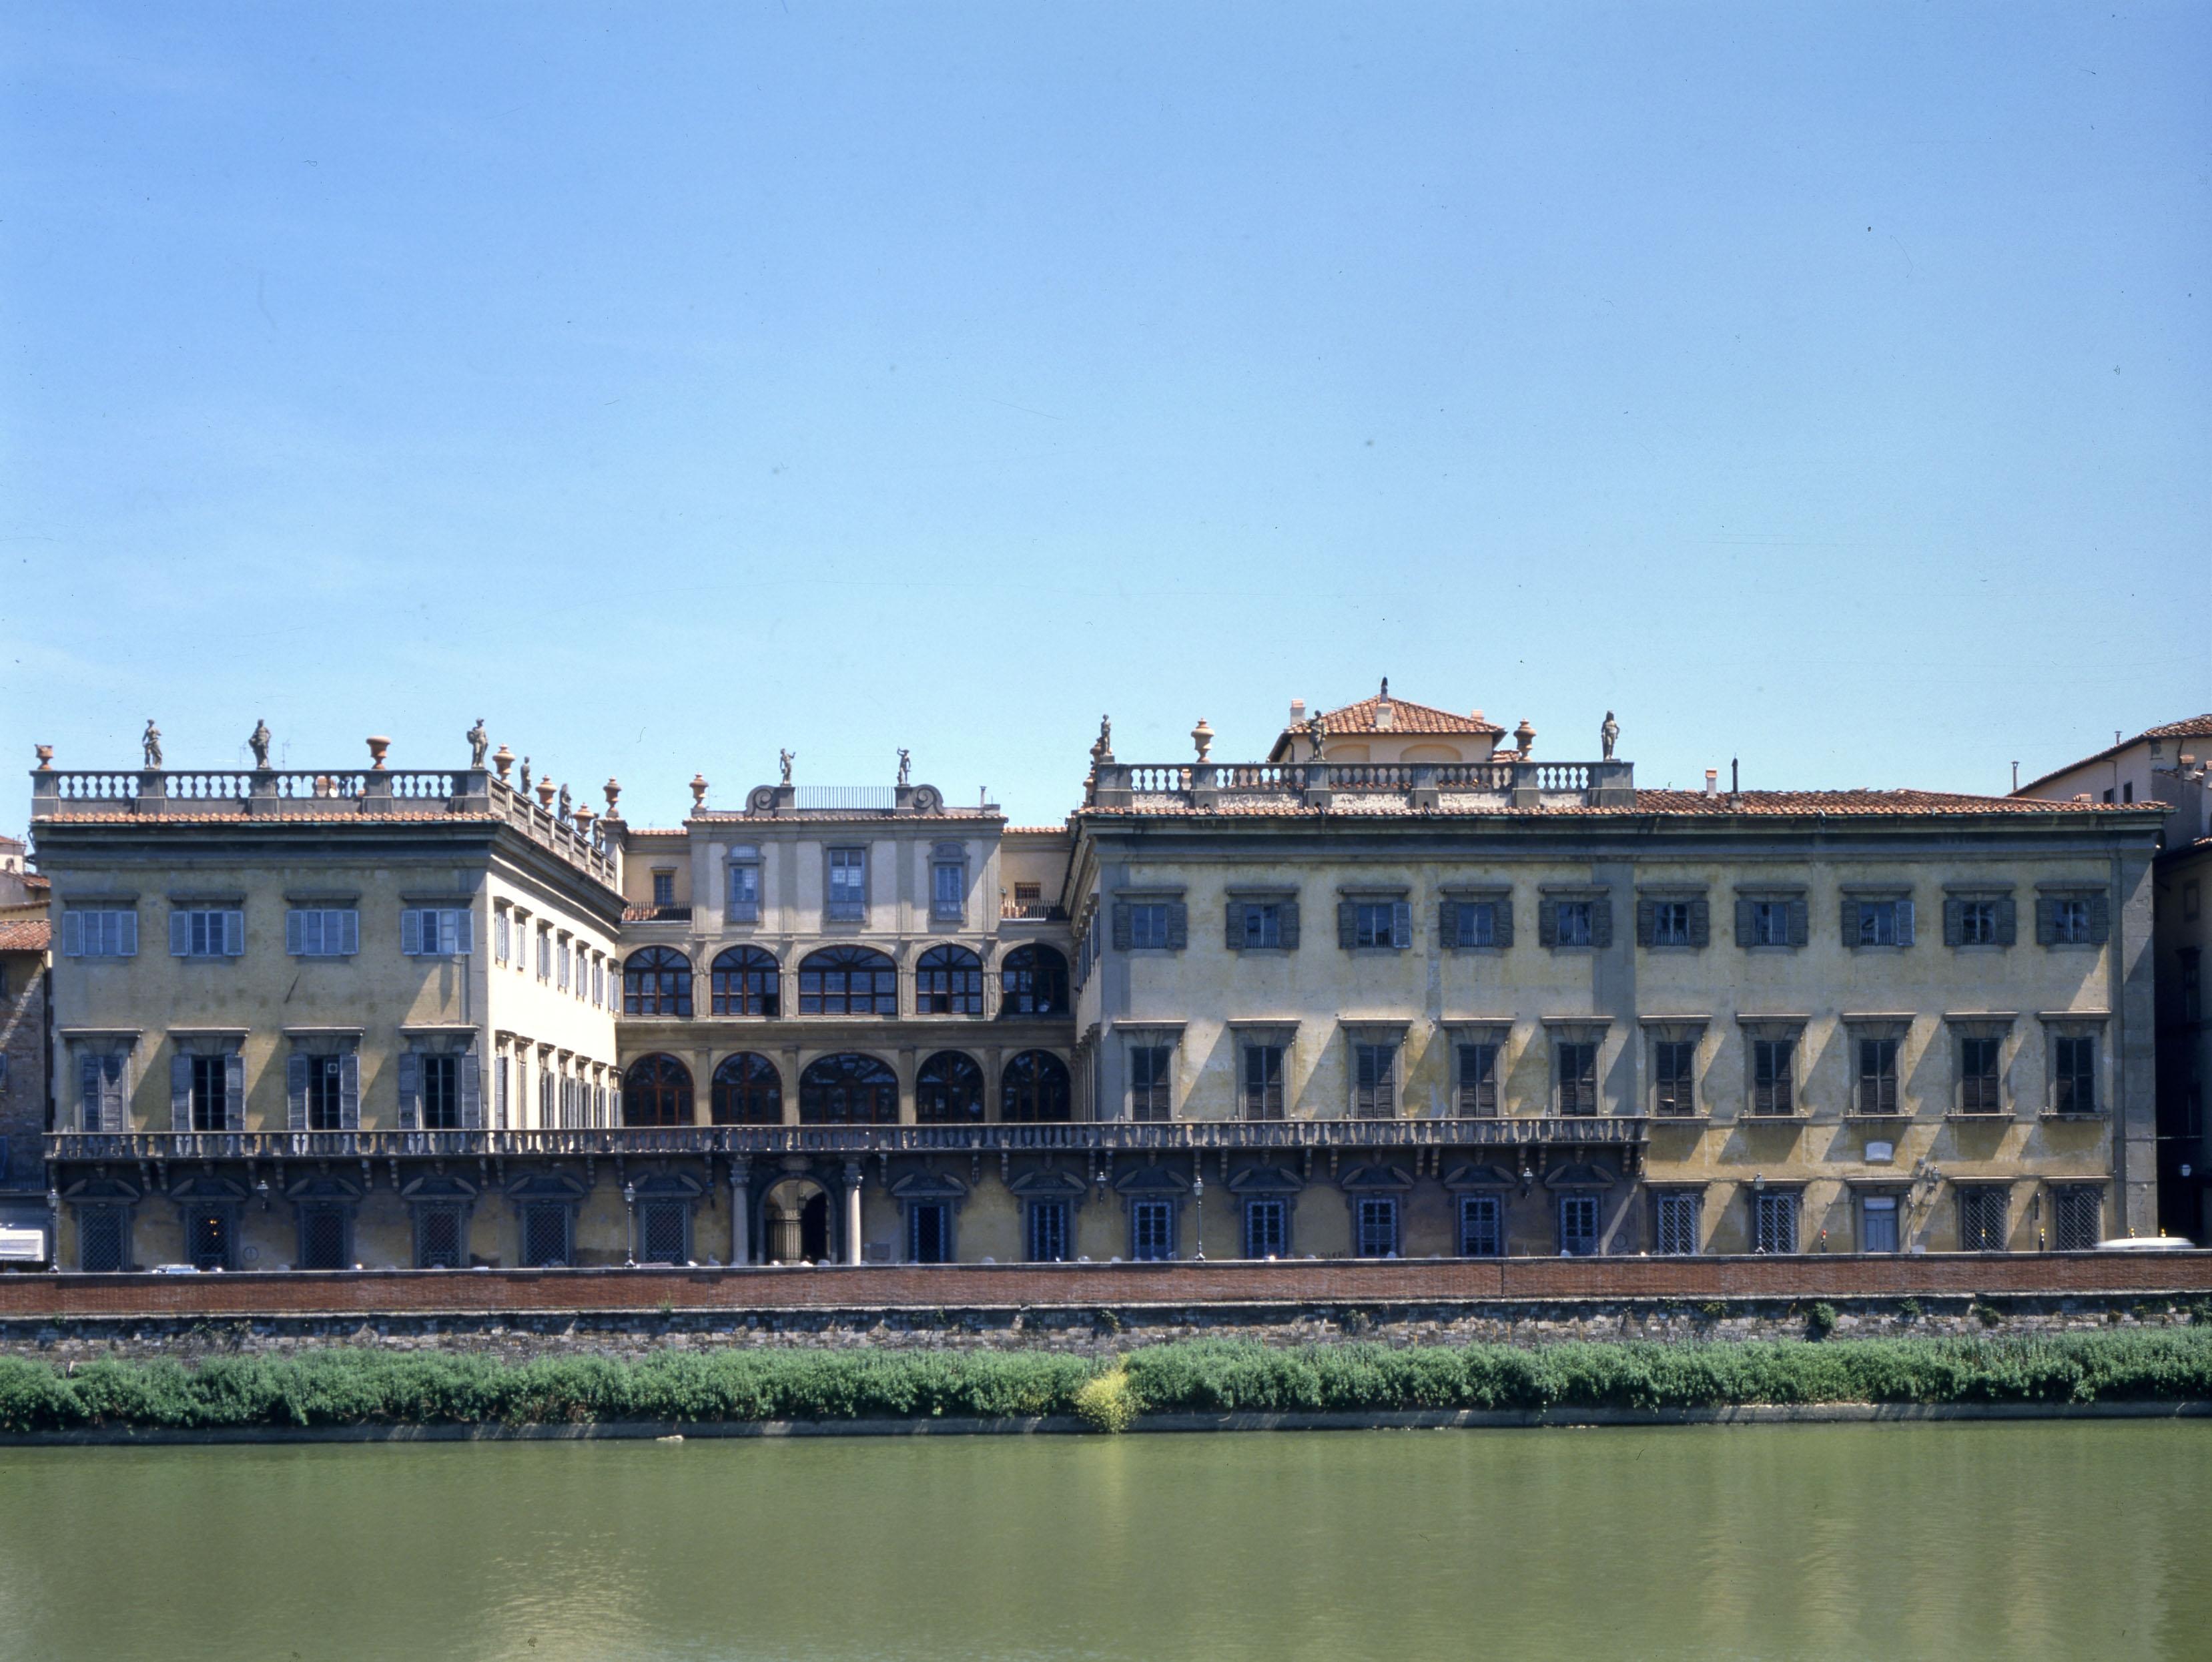 https://www.artribune.com/wp-content/uploads/2015/09/Veduta-dinsieme-di-Palazzo-Corsini.jpg